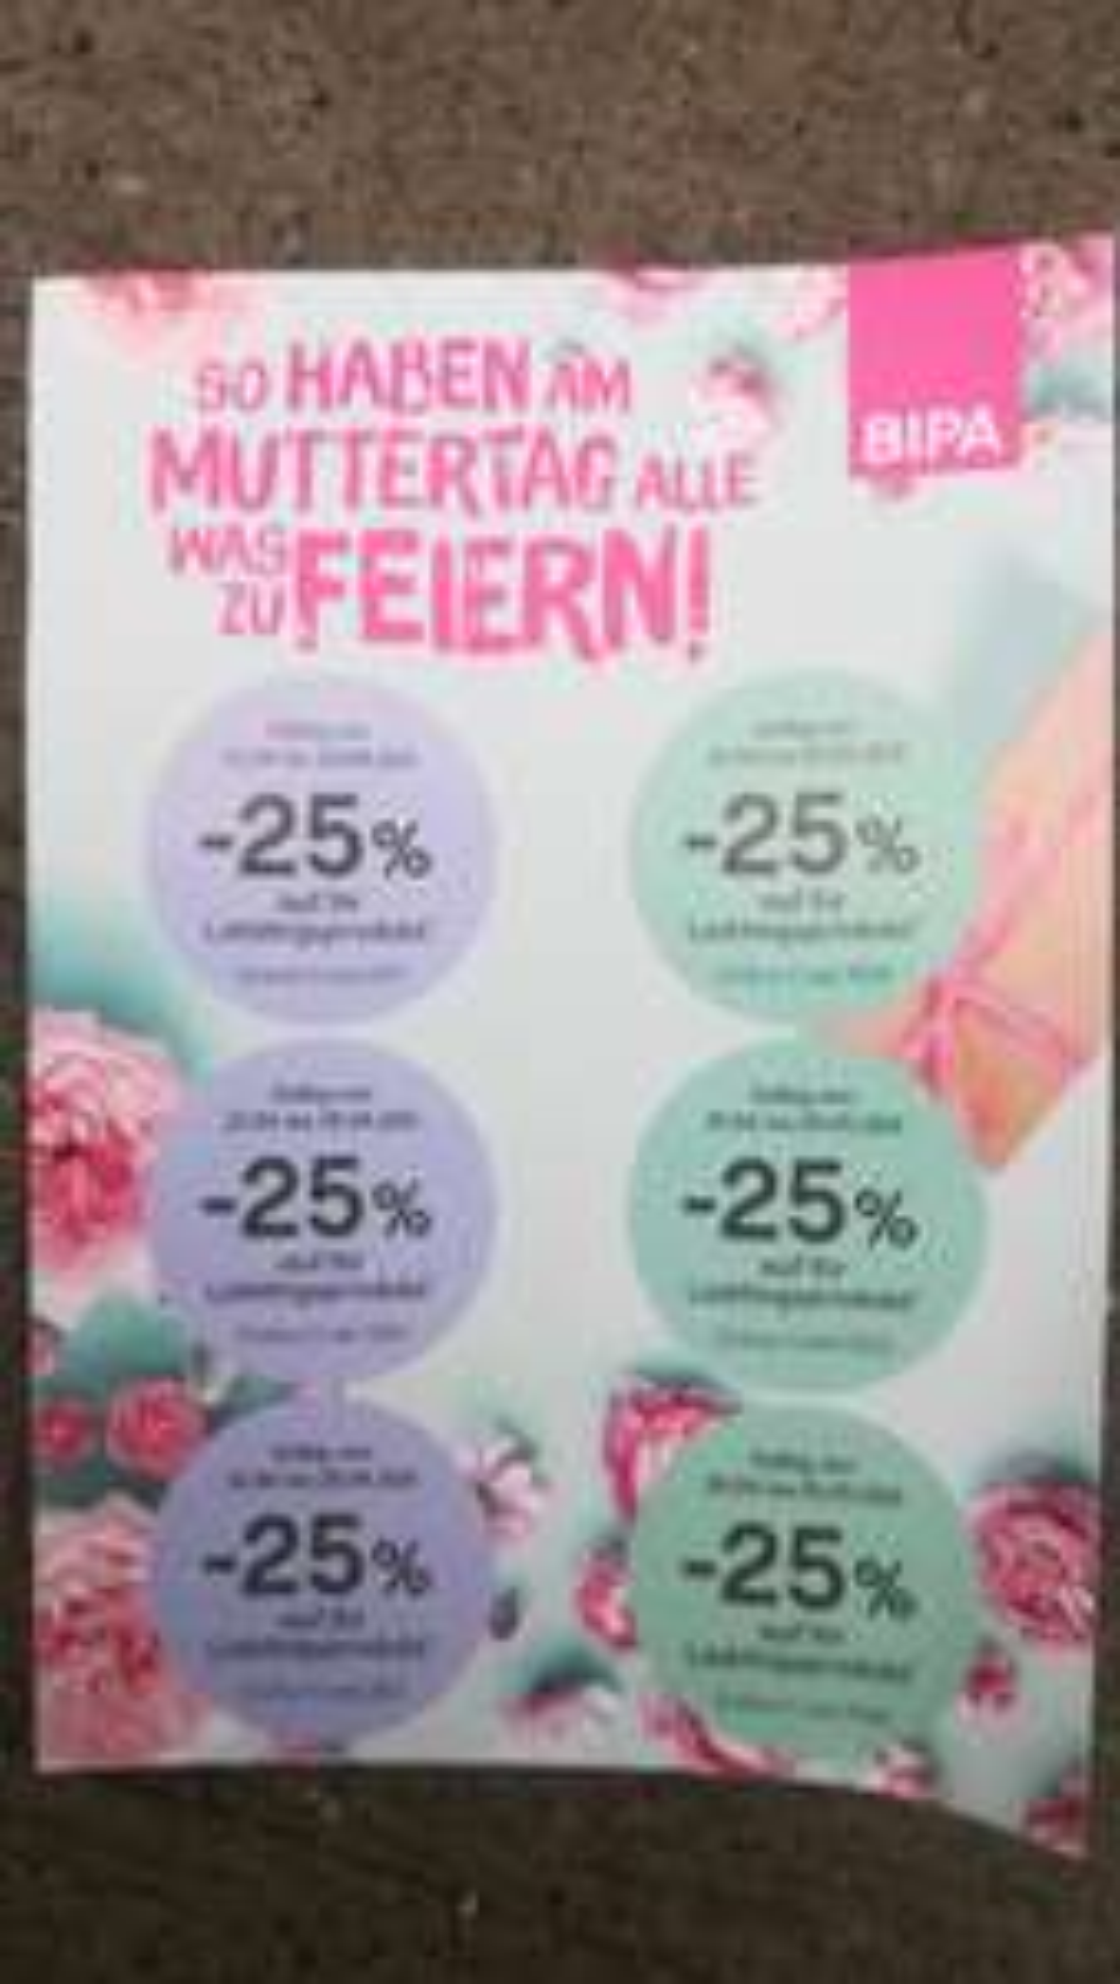 Bipa - 25% Sticker